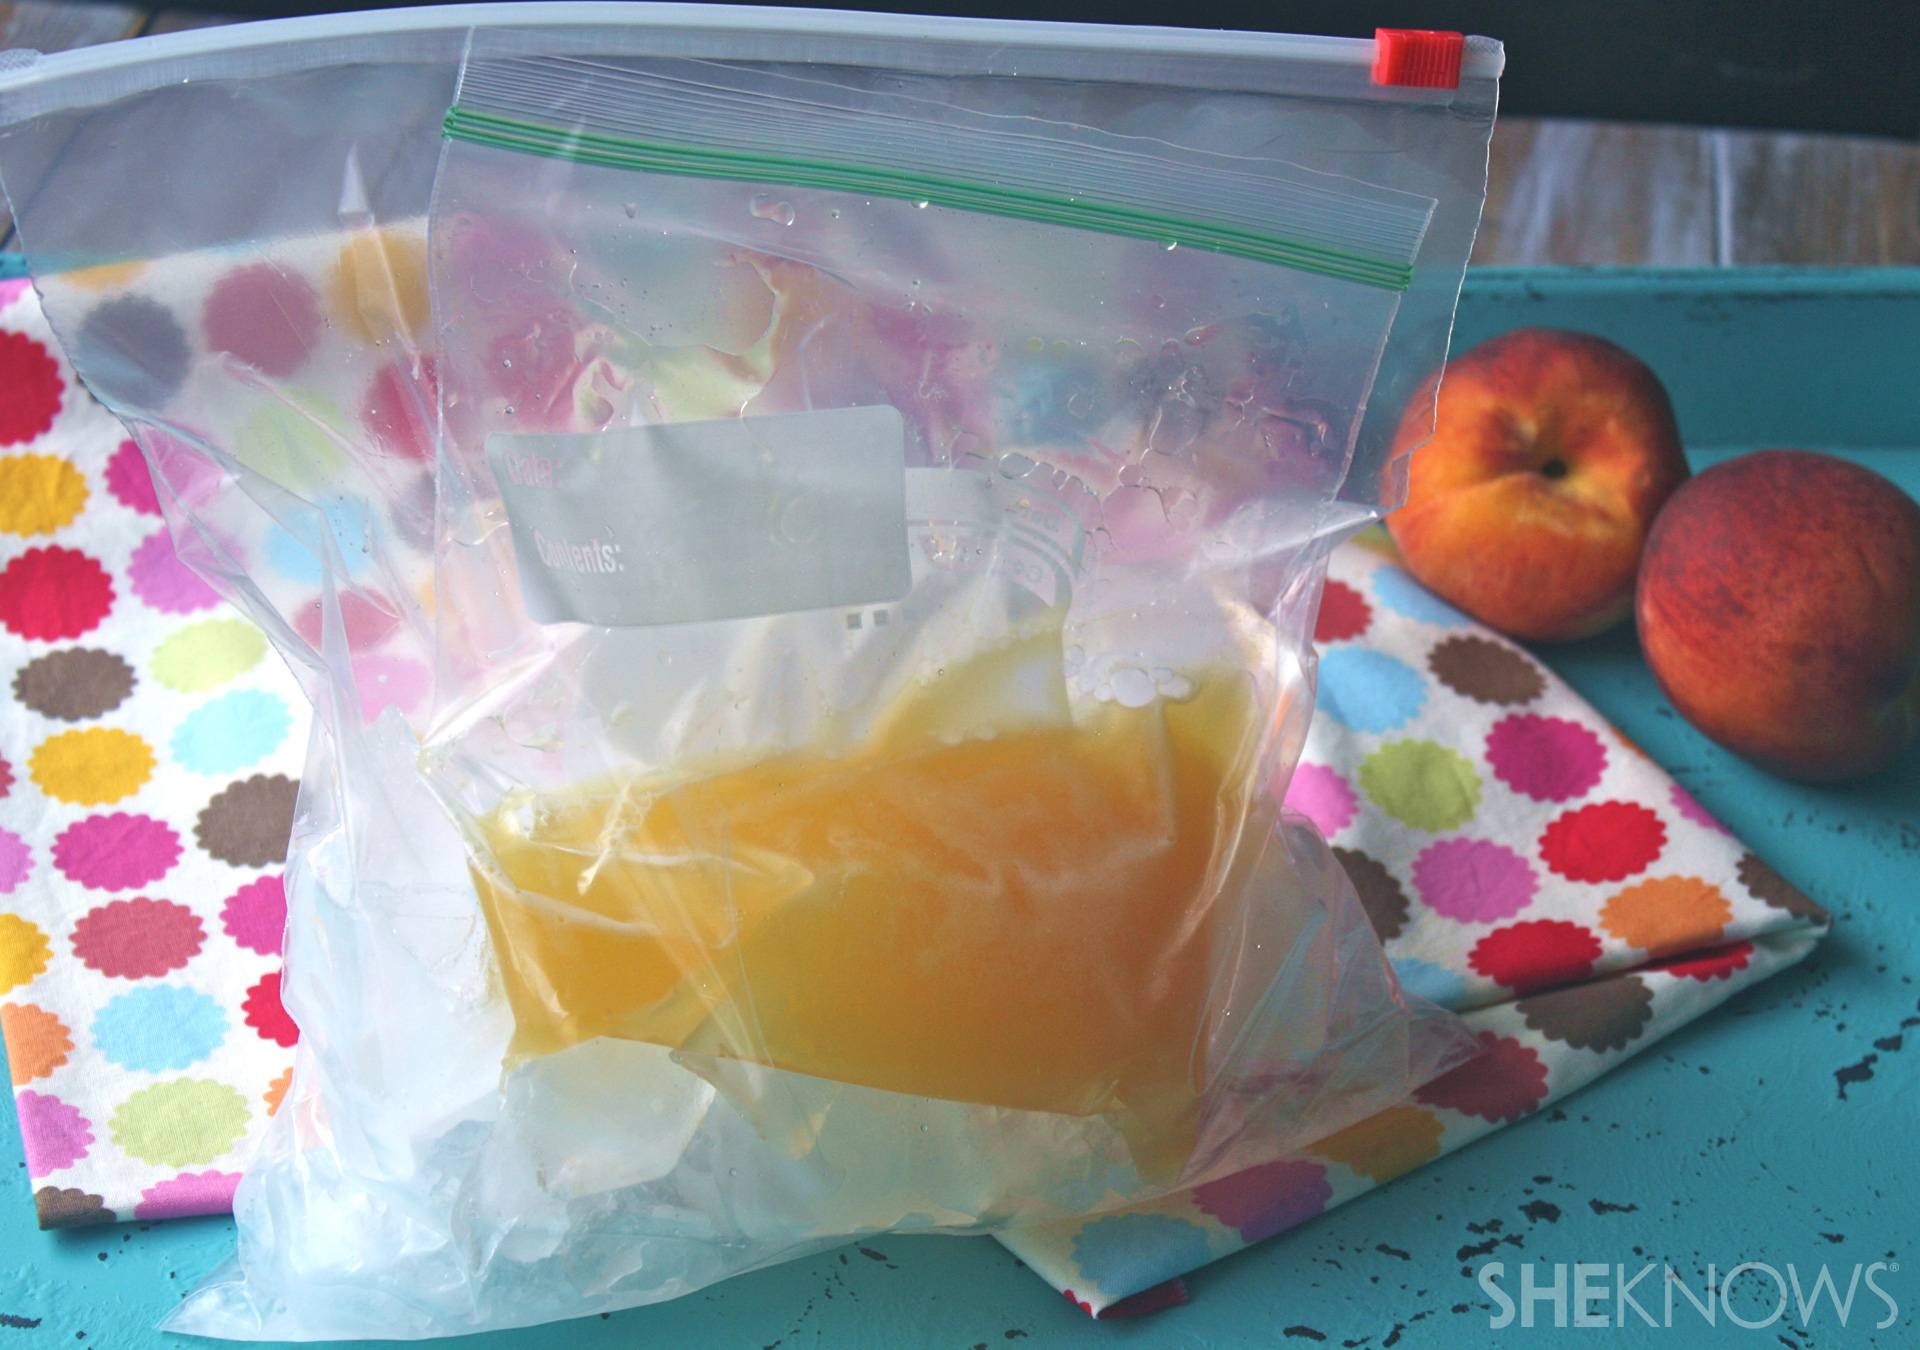 Family fun making sorbet in a bag